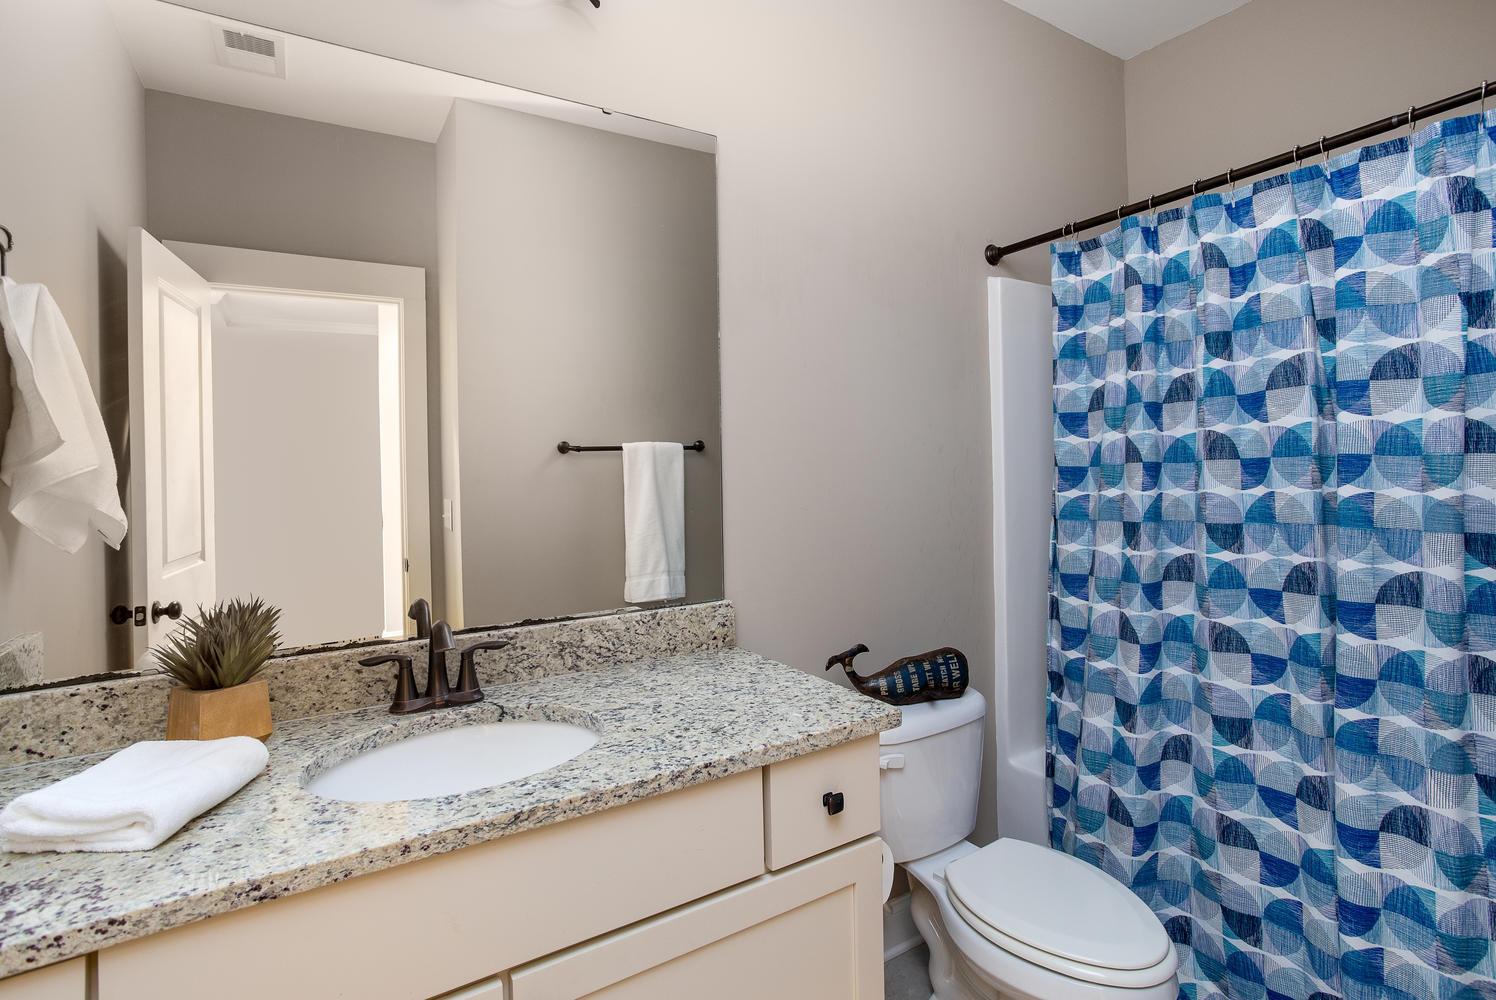 Etiwan Pointe Homes For Sale - 151 Slipper Shell, Mount Pleasant, SC - 29